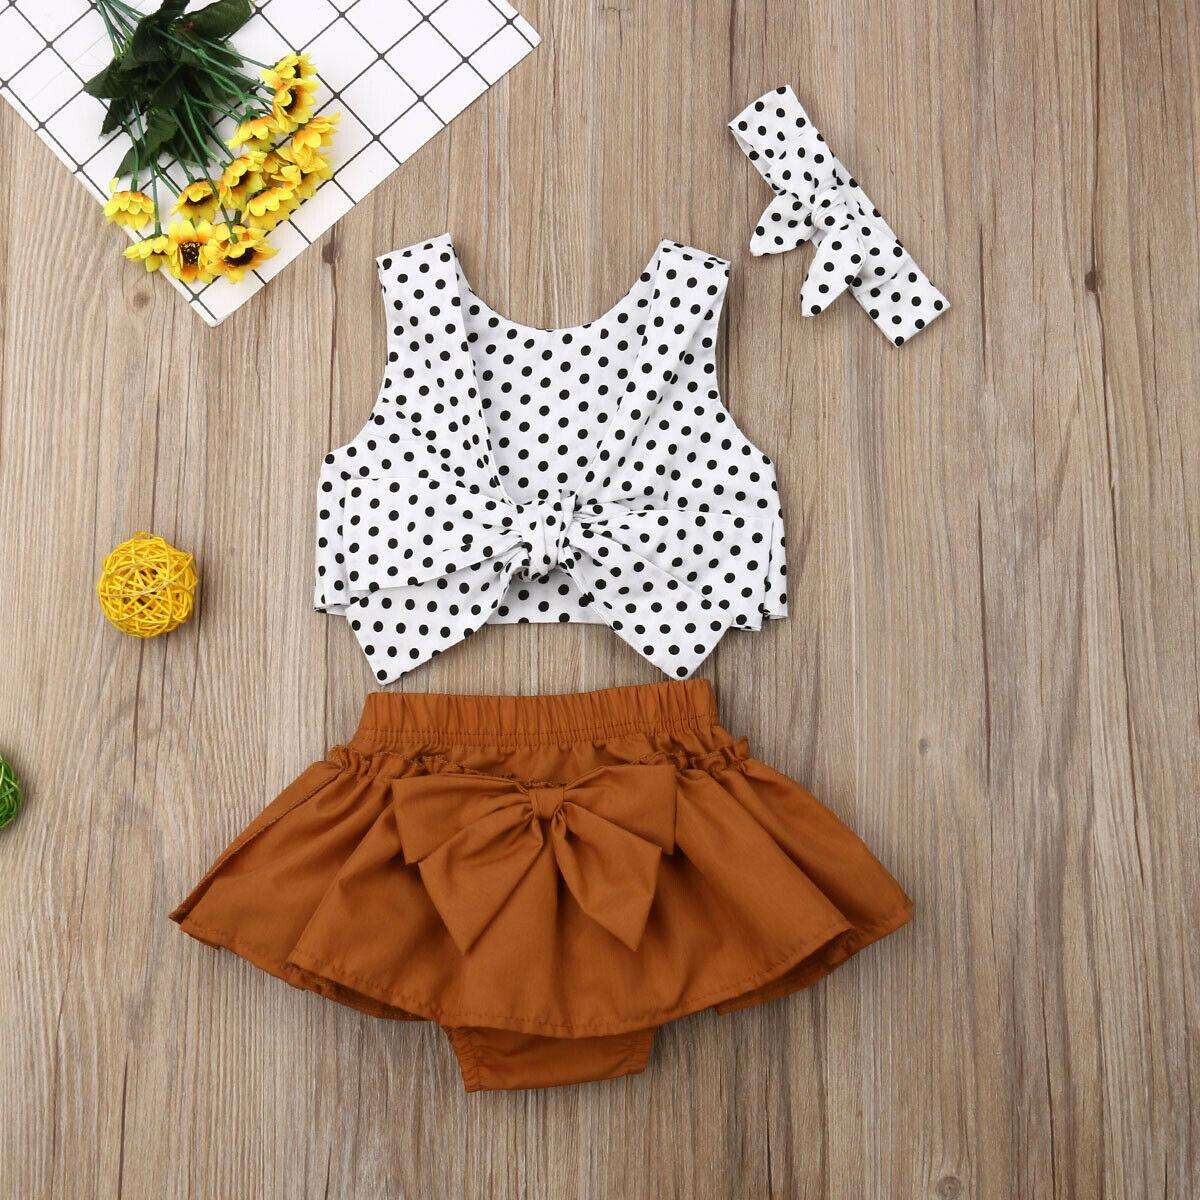 Baby Girls Polka Dot Tops +Bow Knot Skirt + Headband 3PCS Set